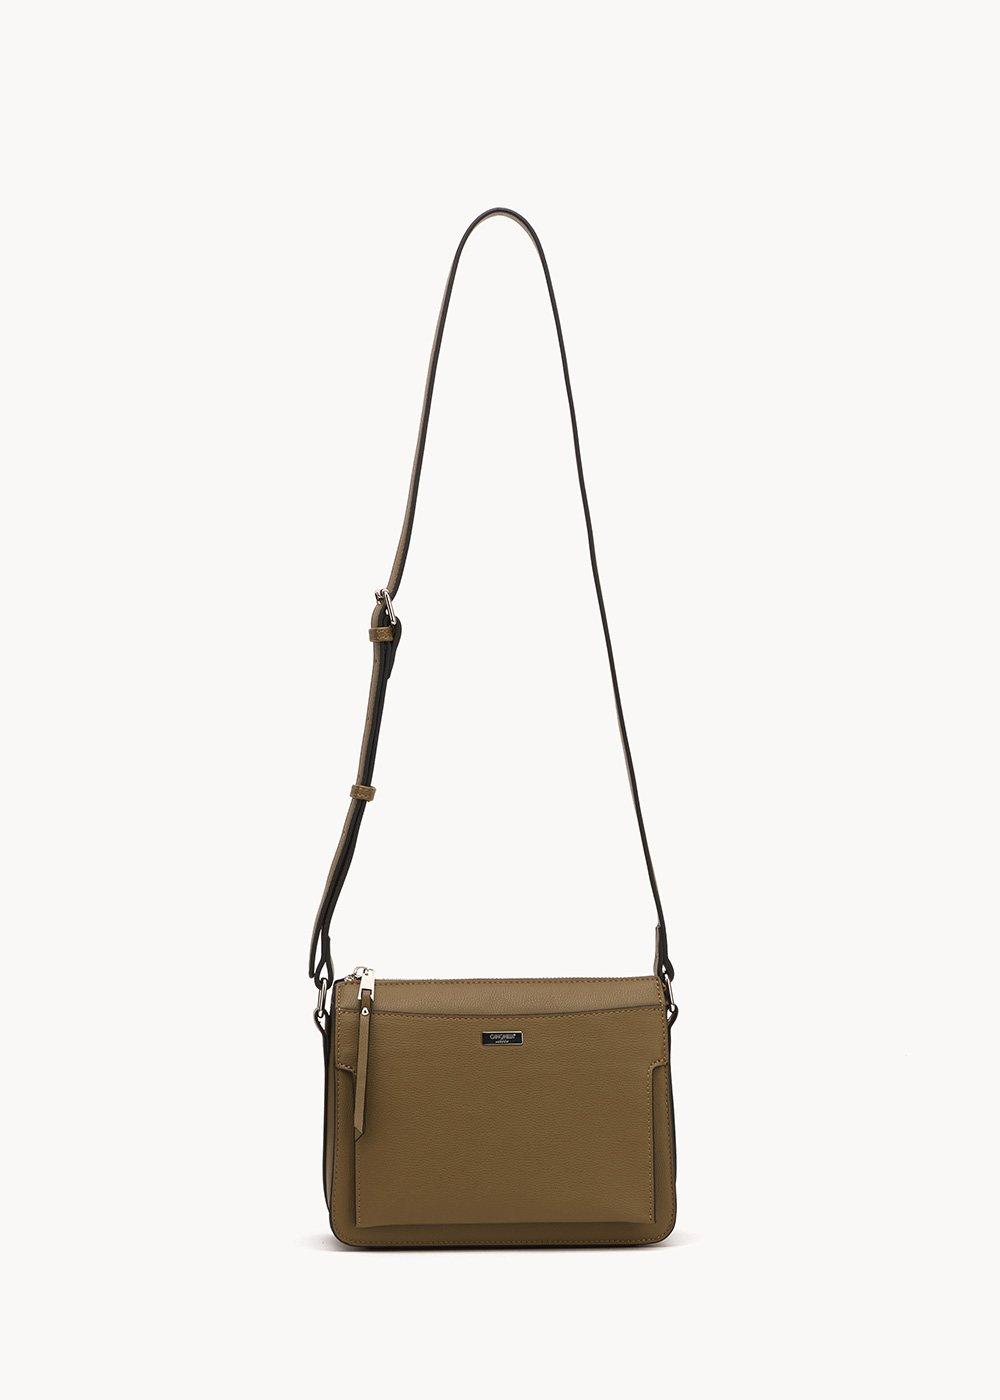 Borake shoulder bag - Green - Woman